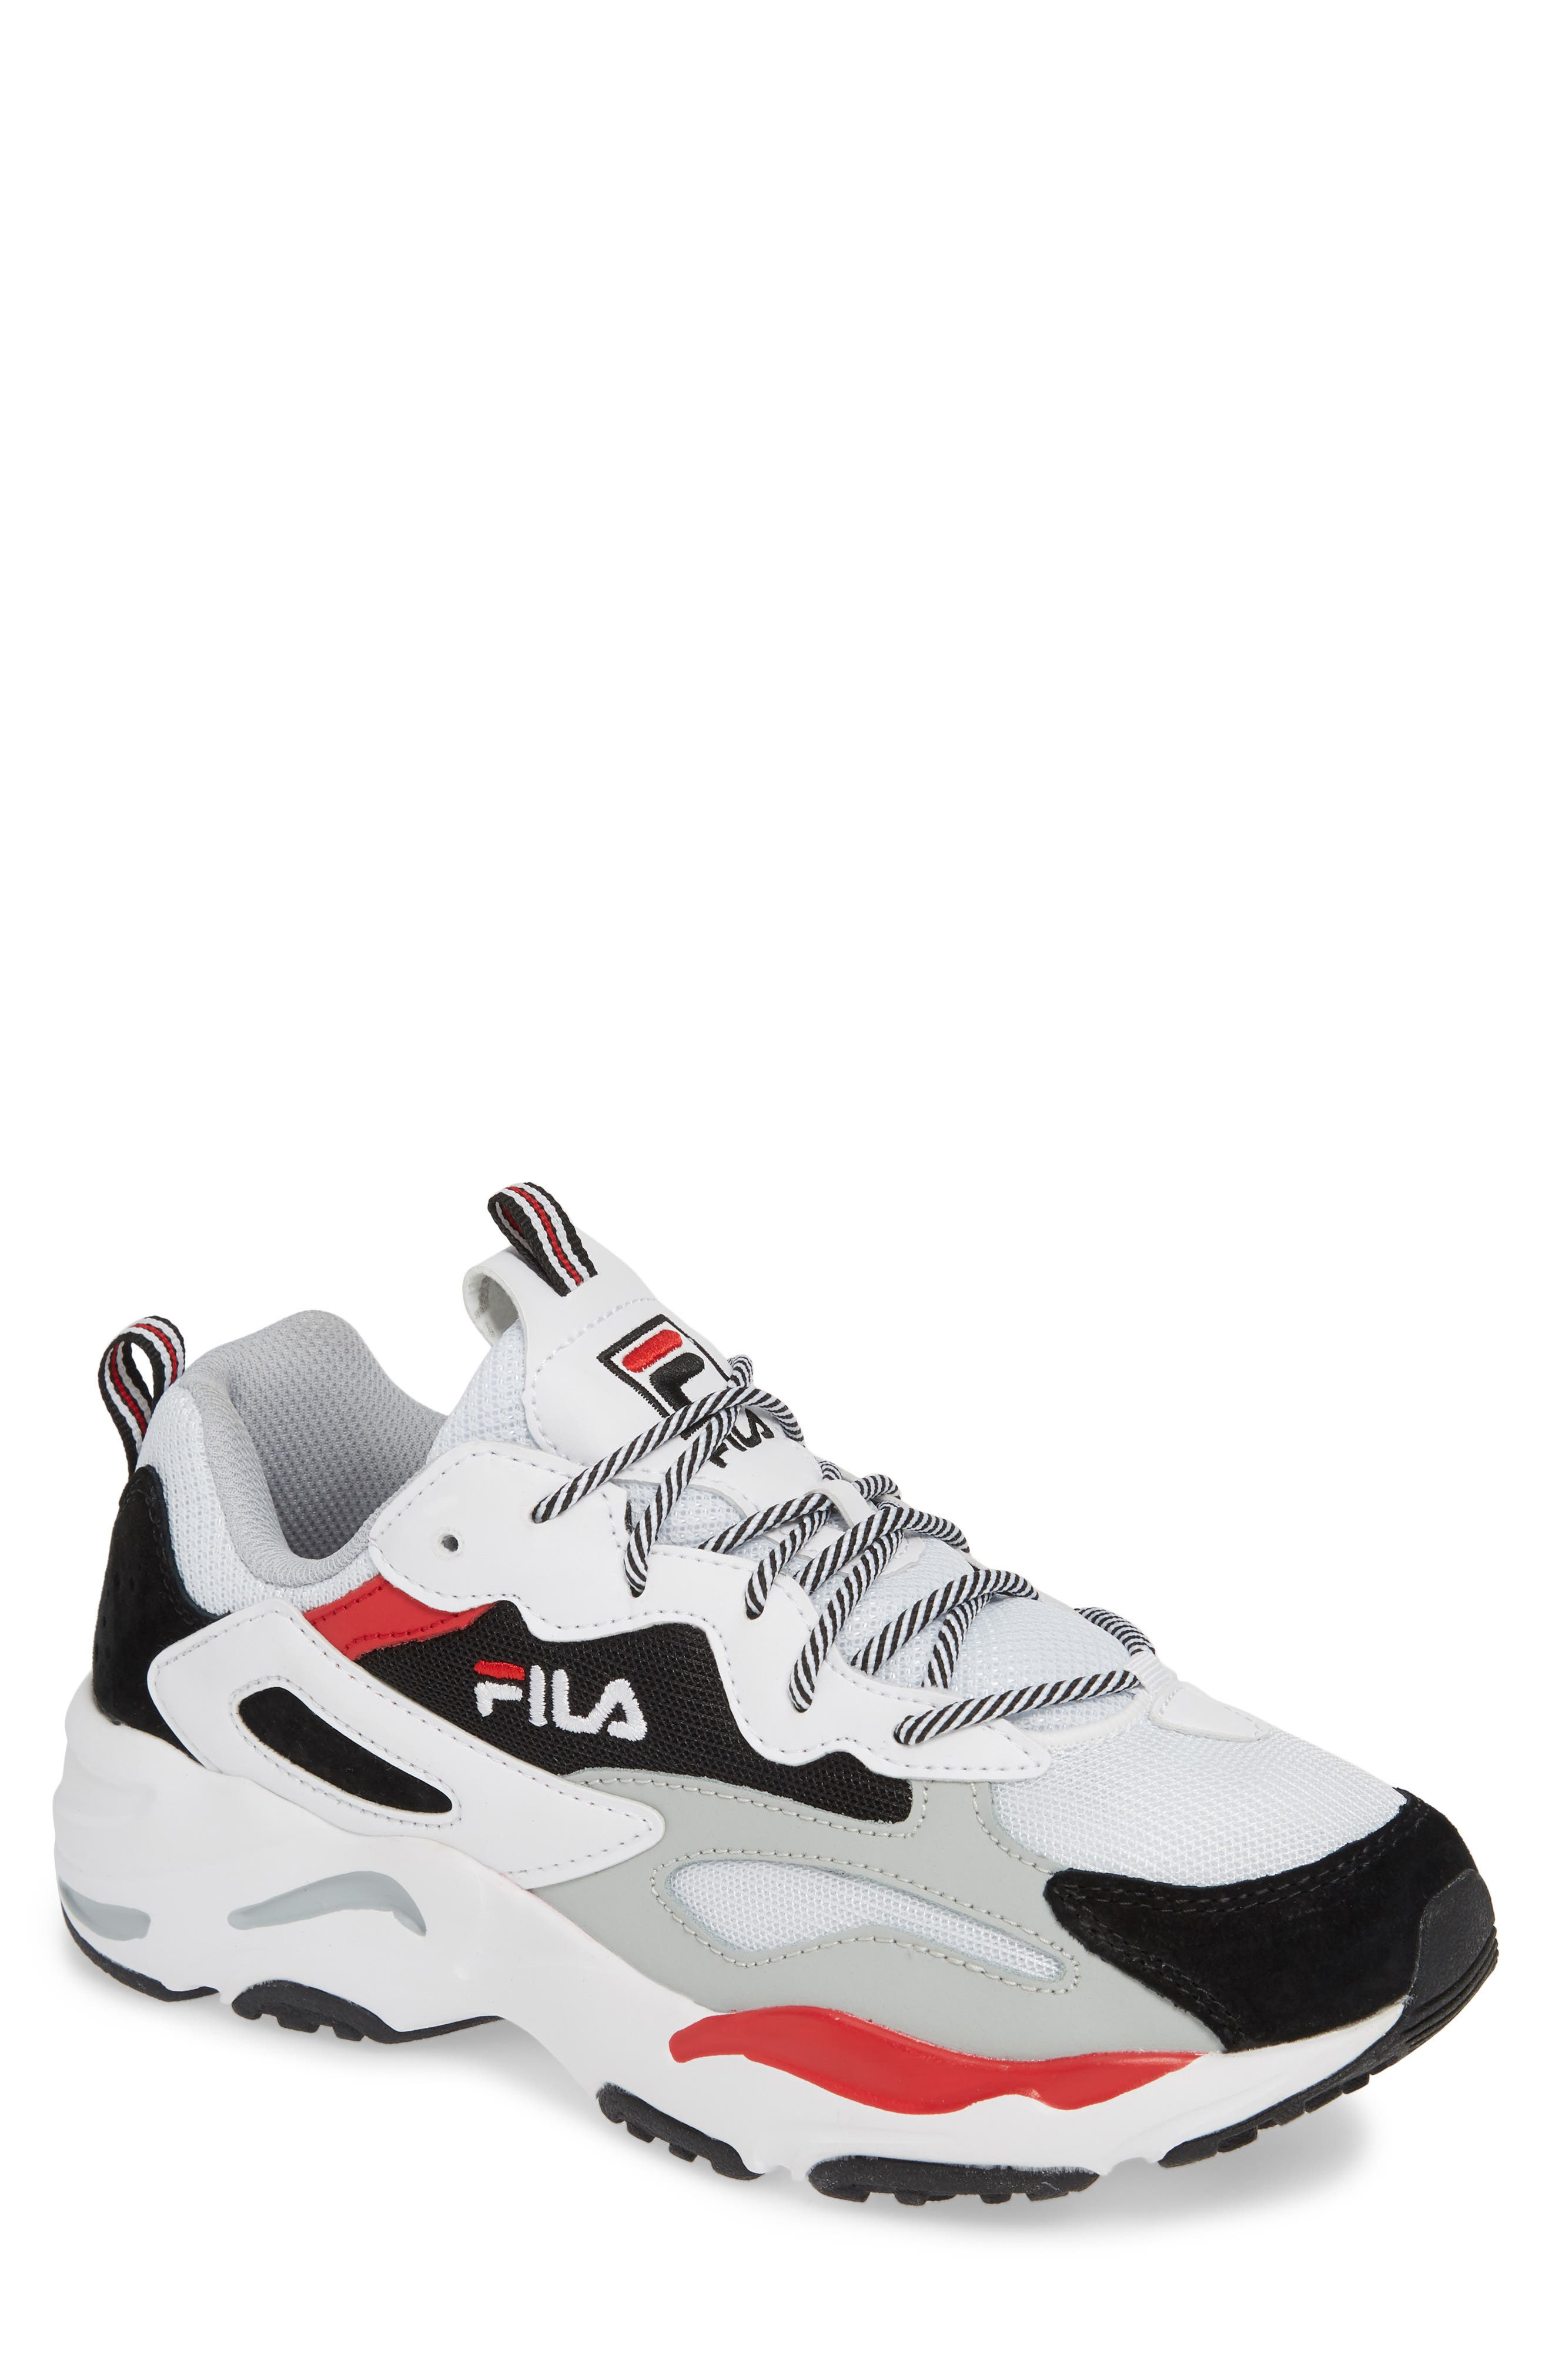 FILA, Ray Tracer Sneaker, Main thumbnail 1, color, WHITE/ BLACK